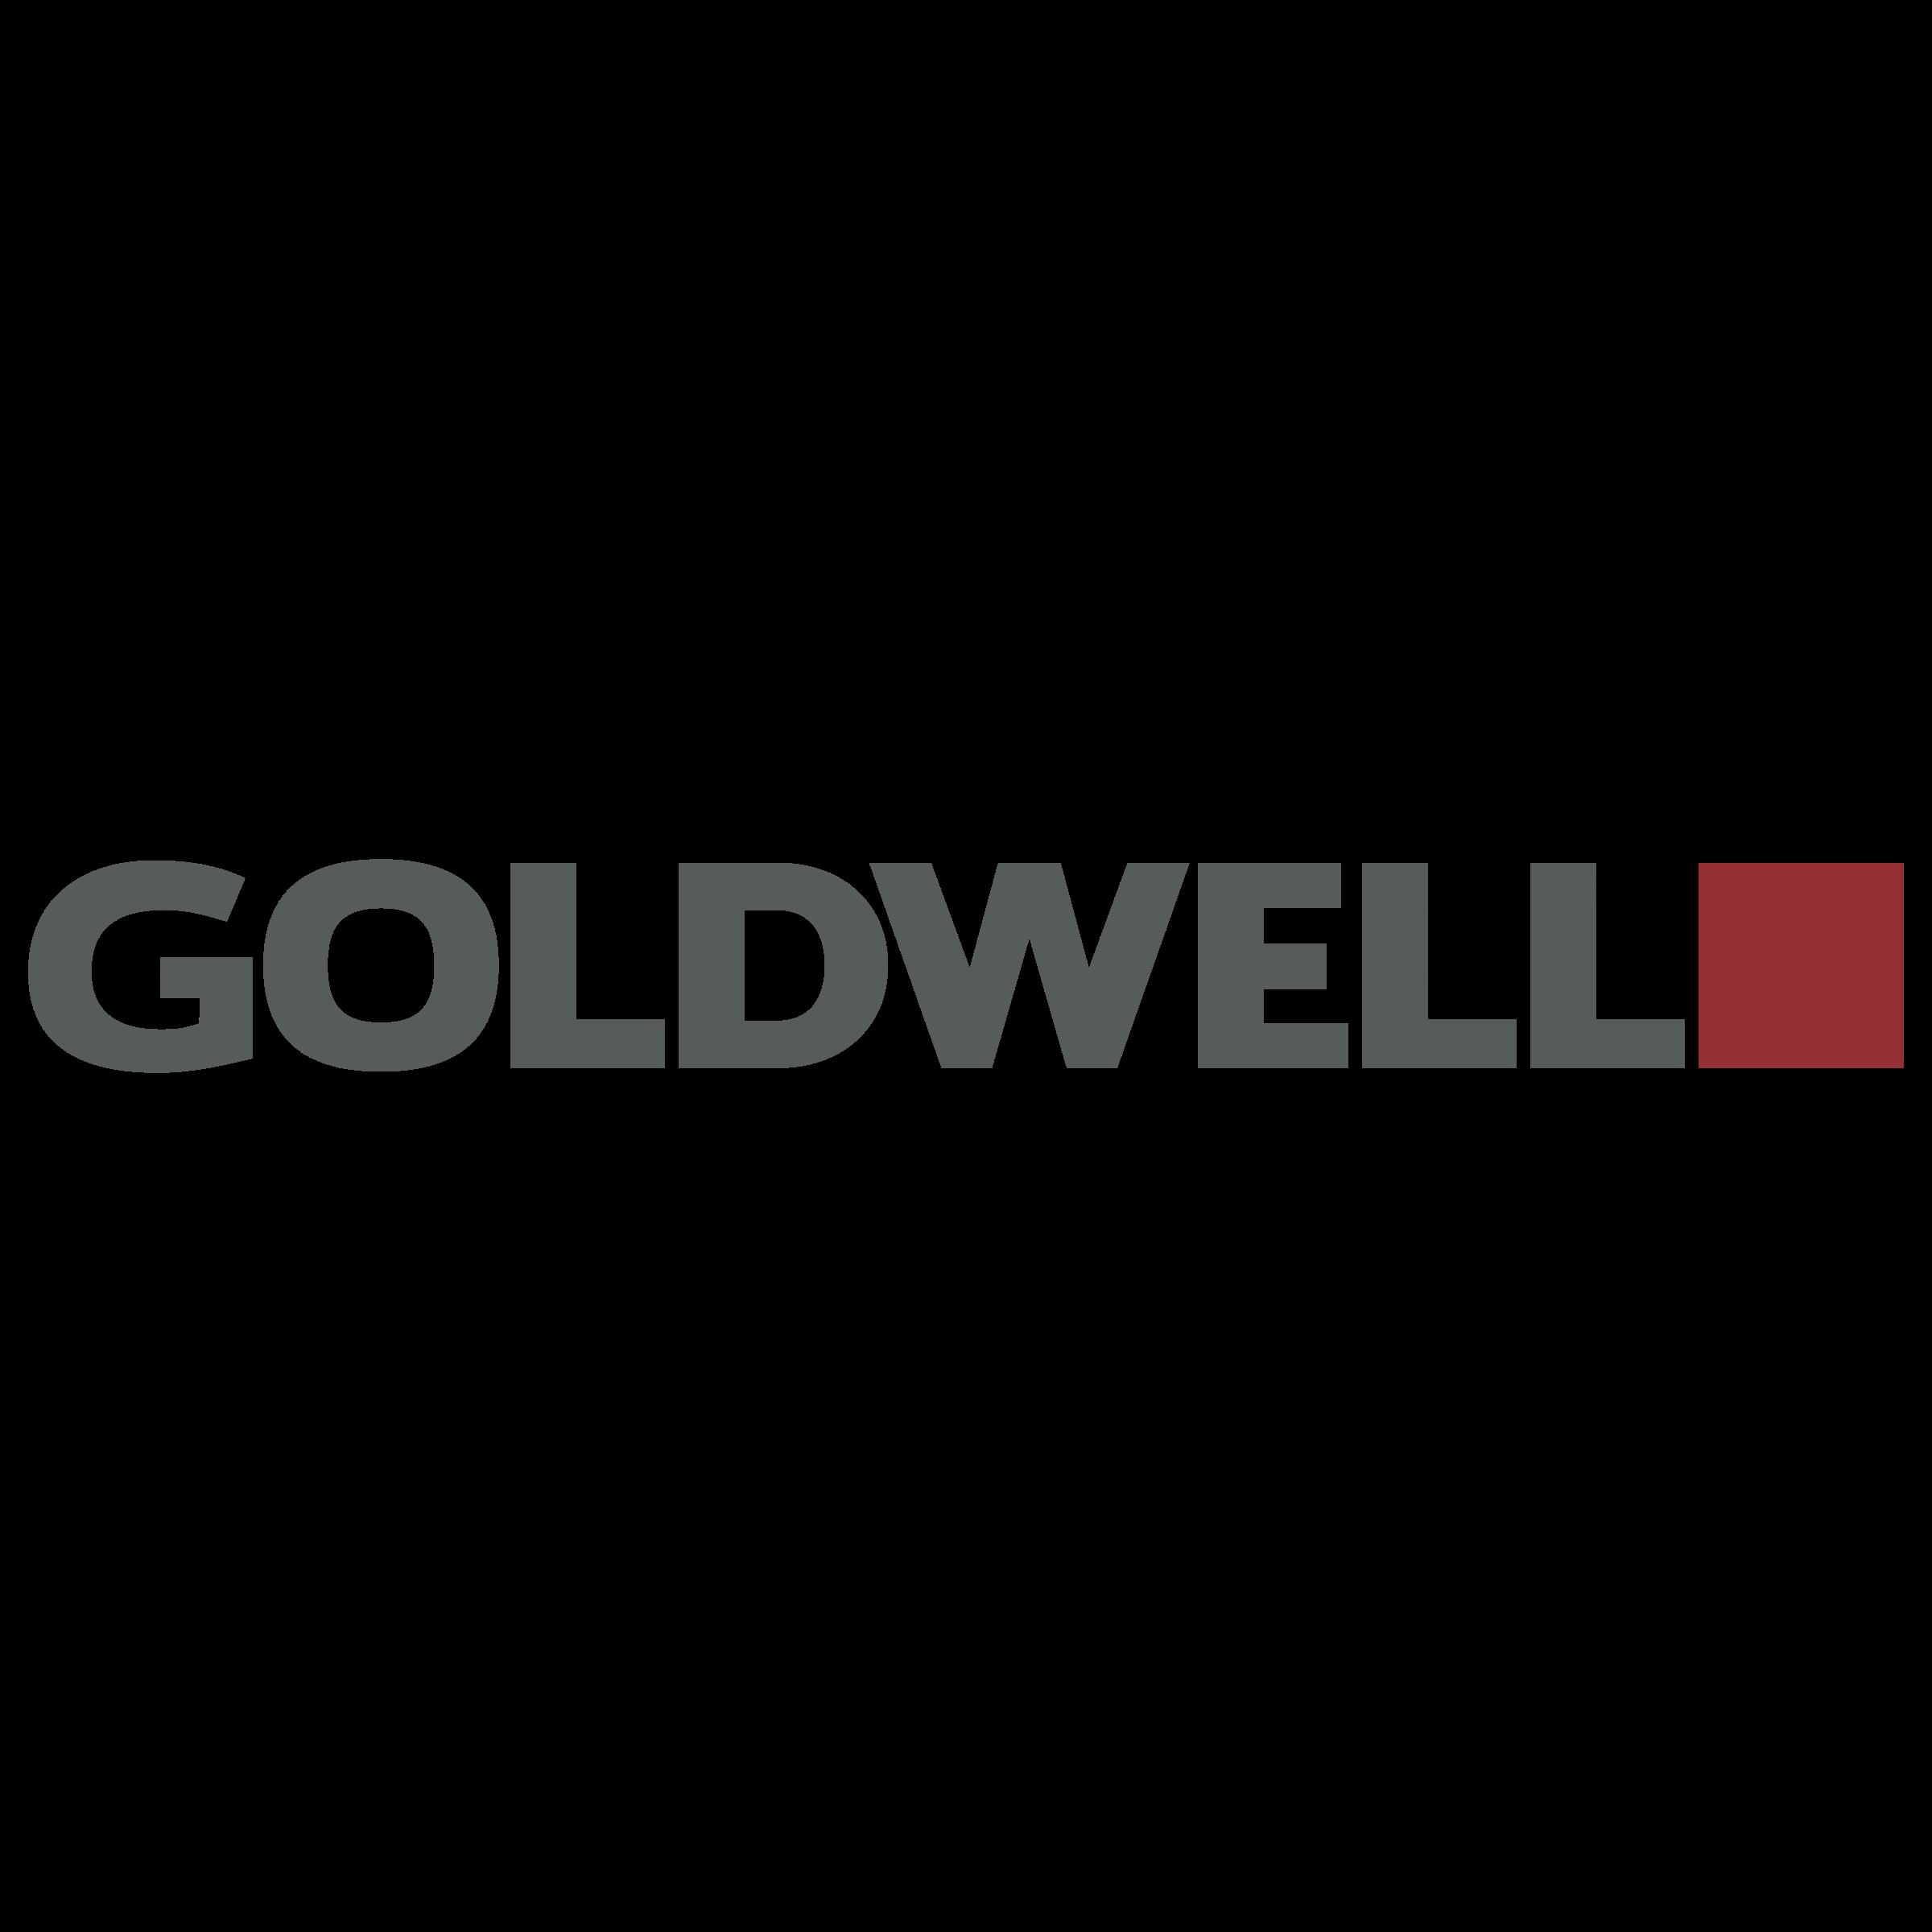 goldwell-logo-png-transparent.png